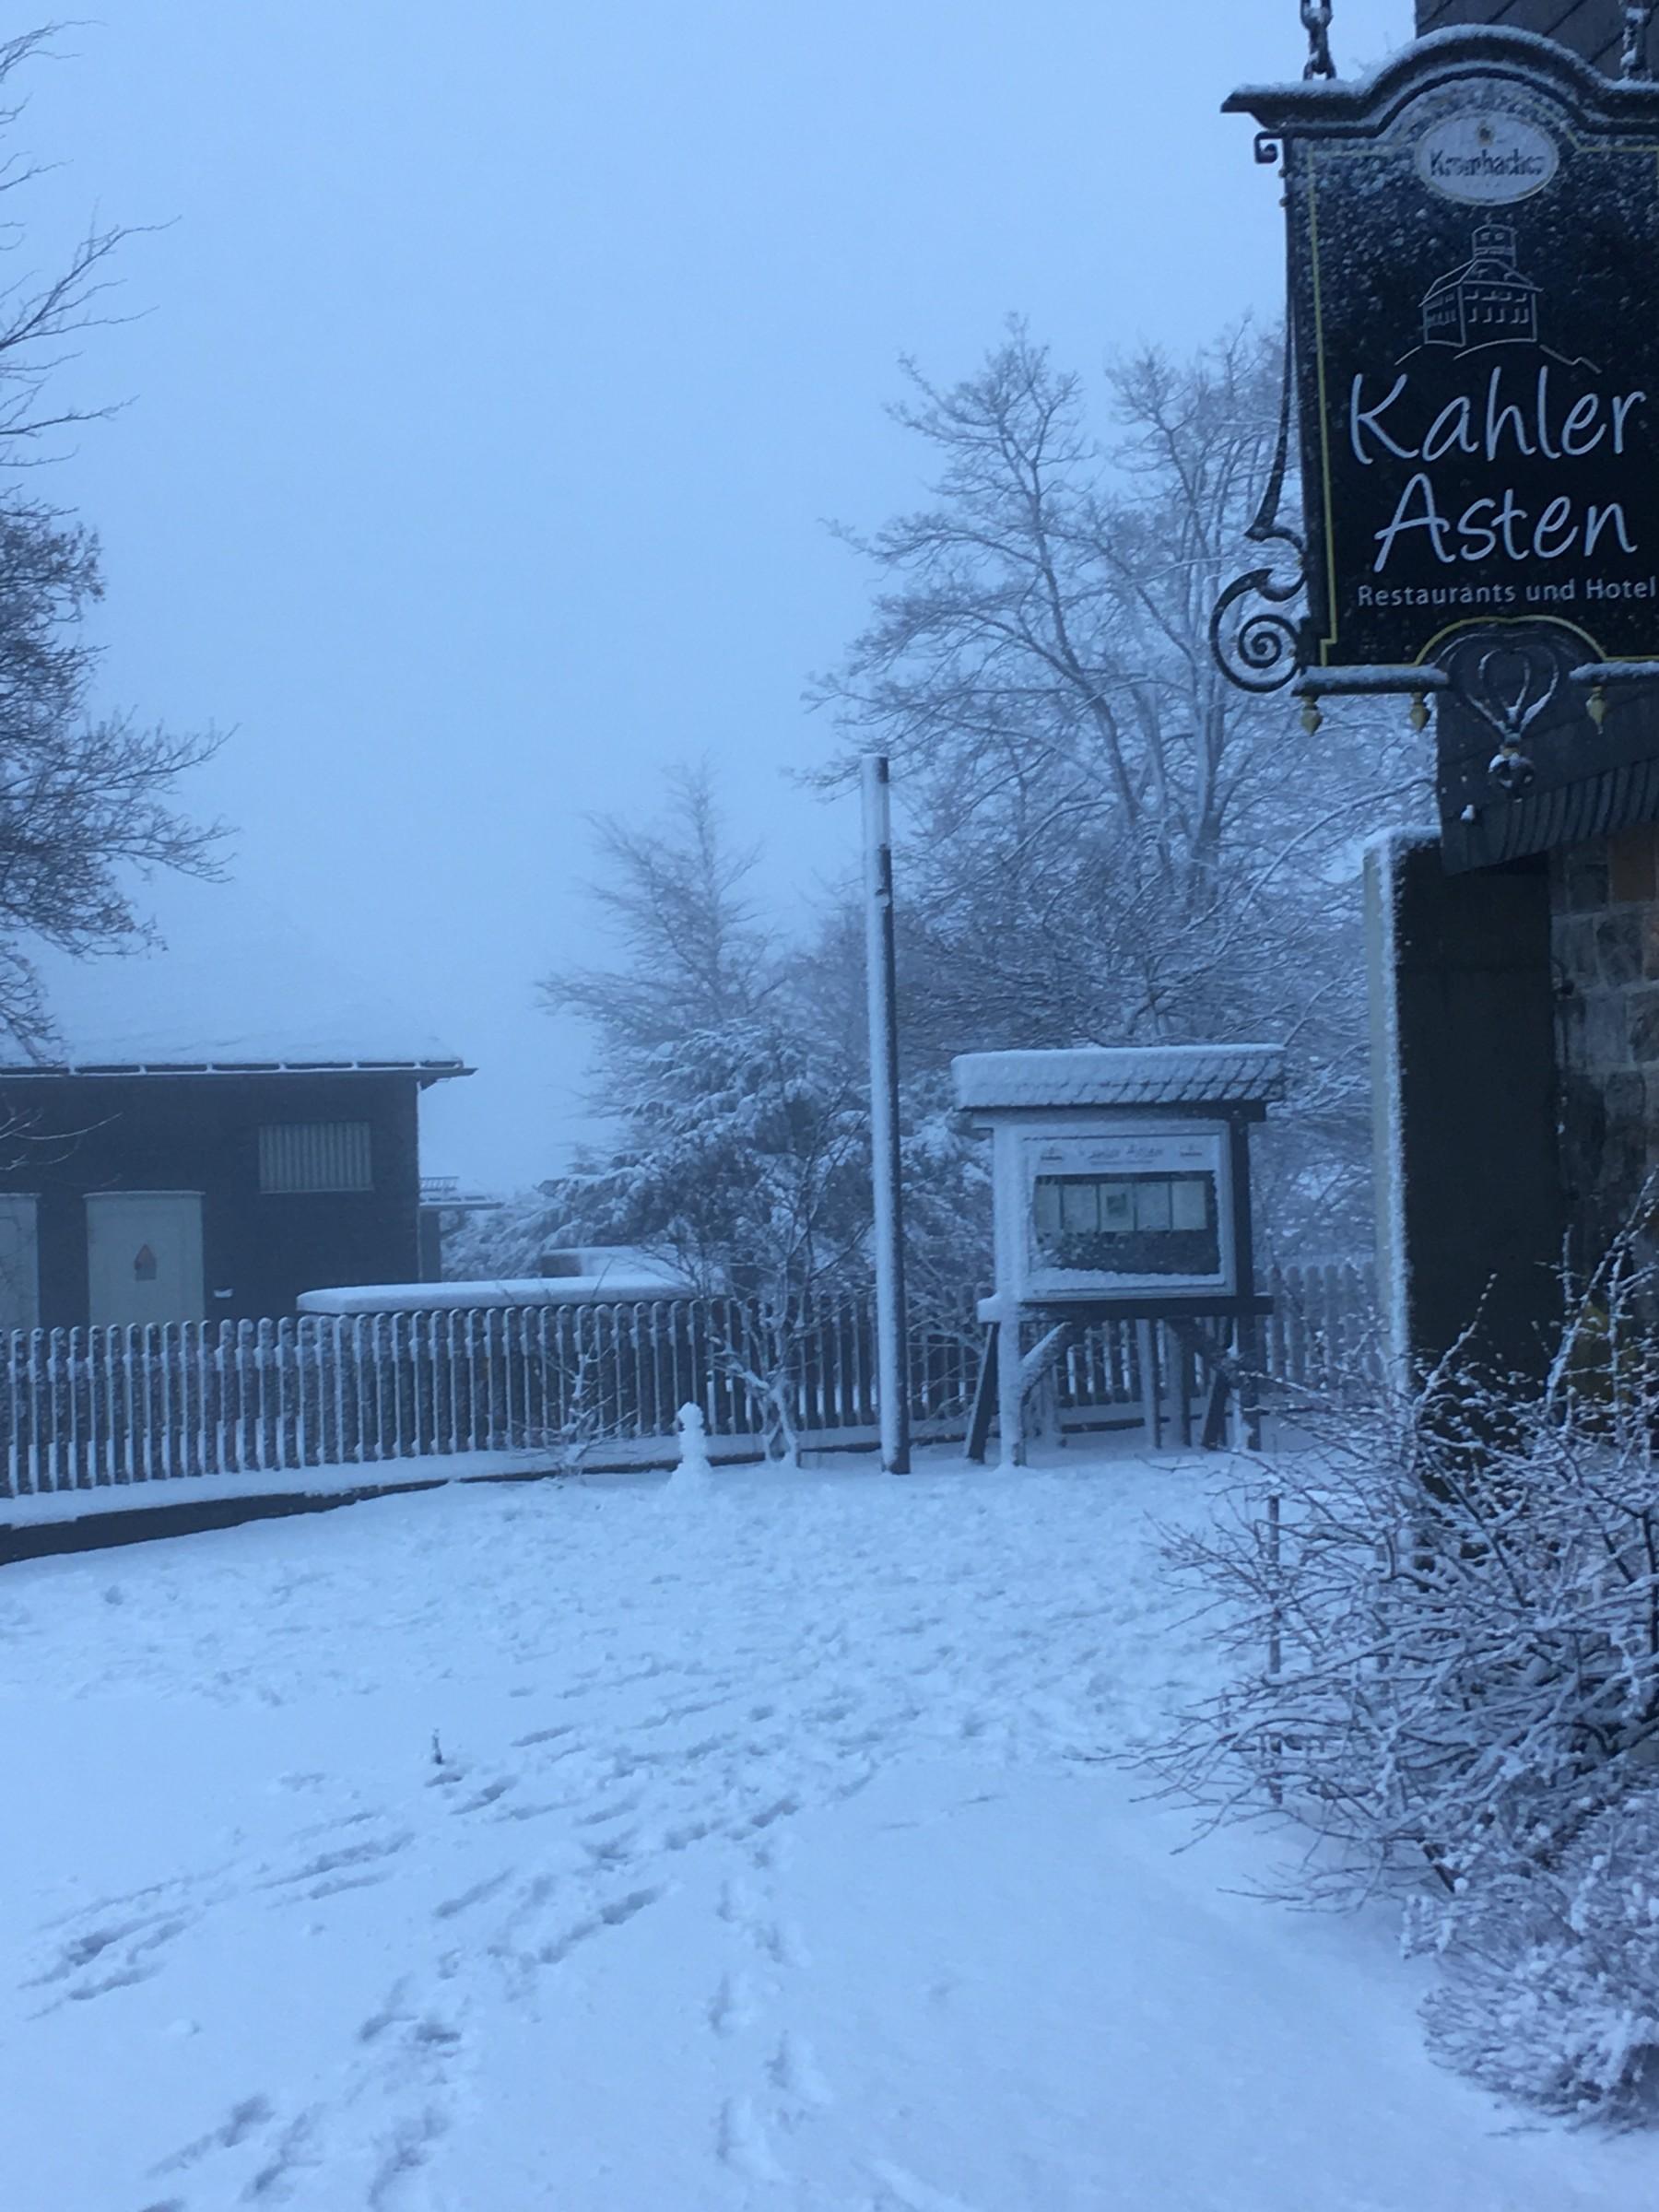 Weerwoord Kahler Asten 14 30 Pics